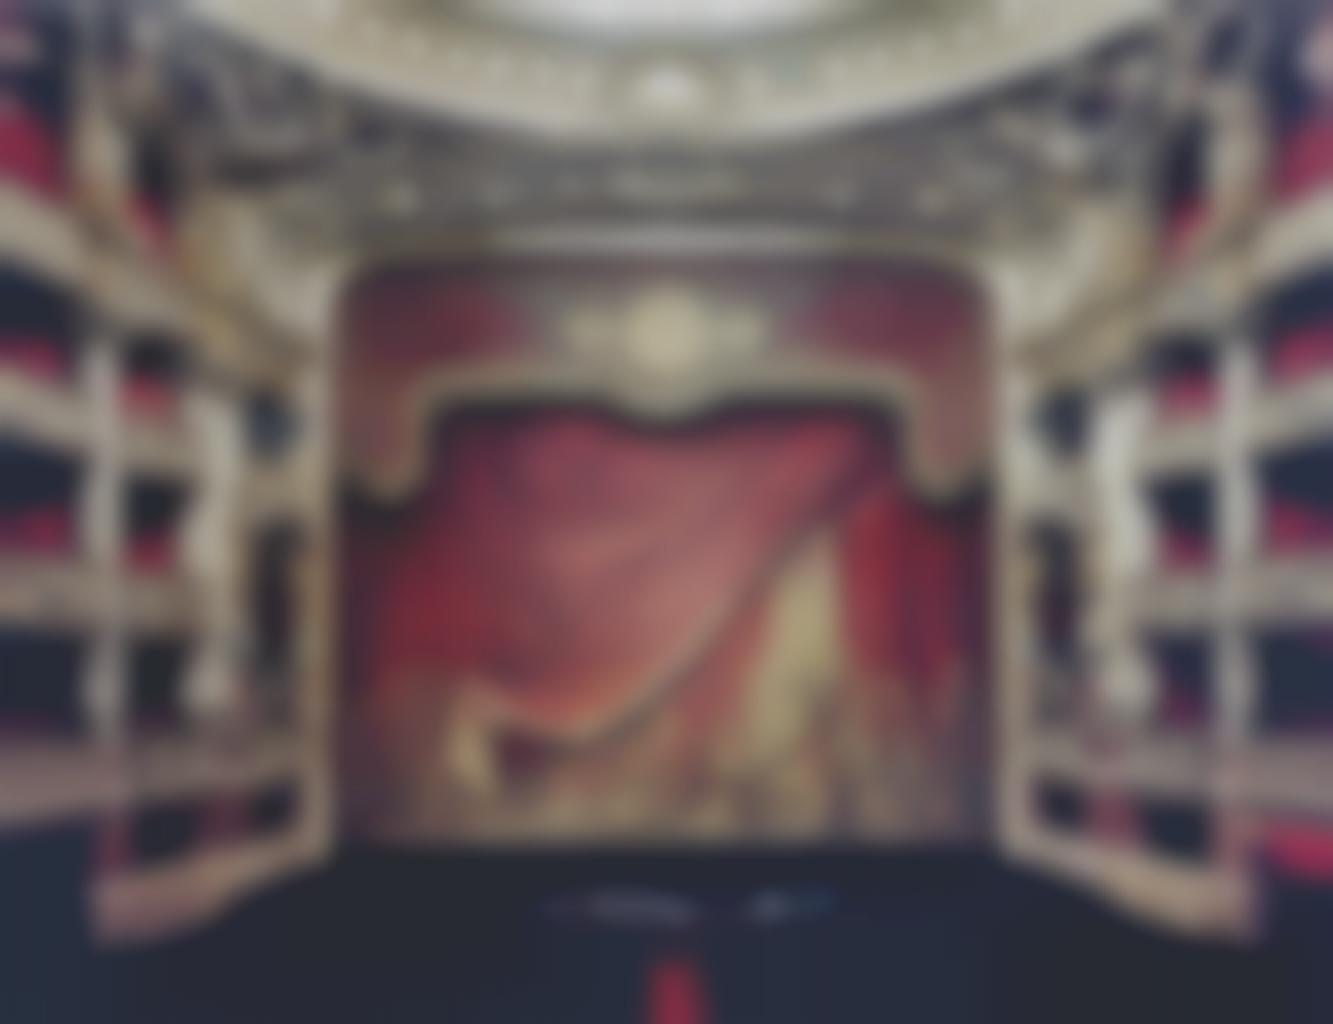 Candida Hofer-Palais Garnier, Paris XXXI-2005